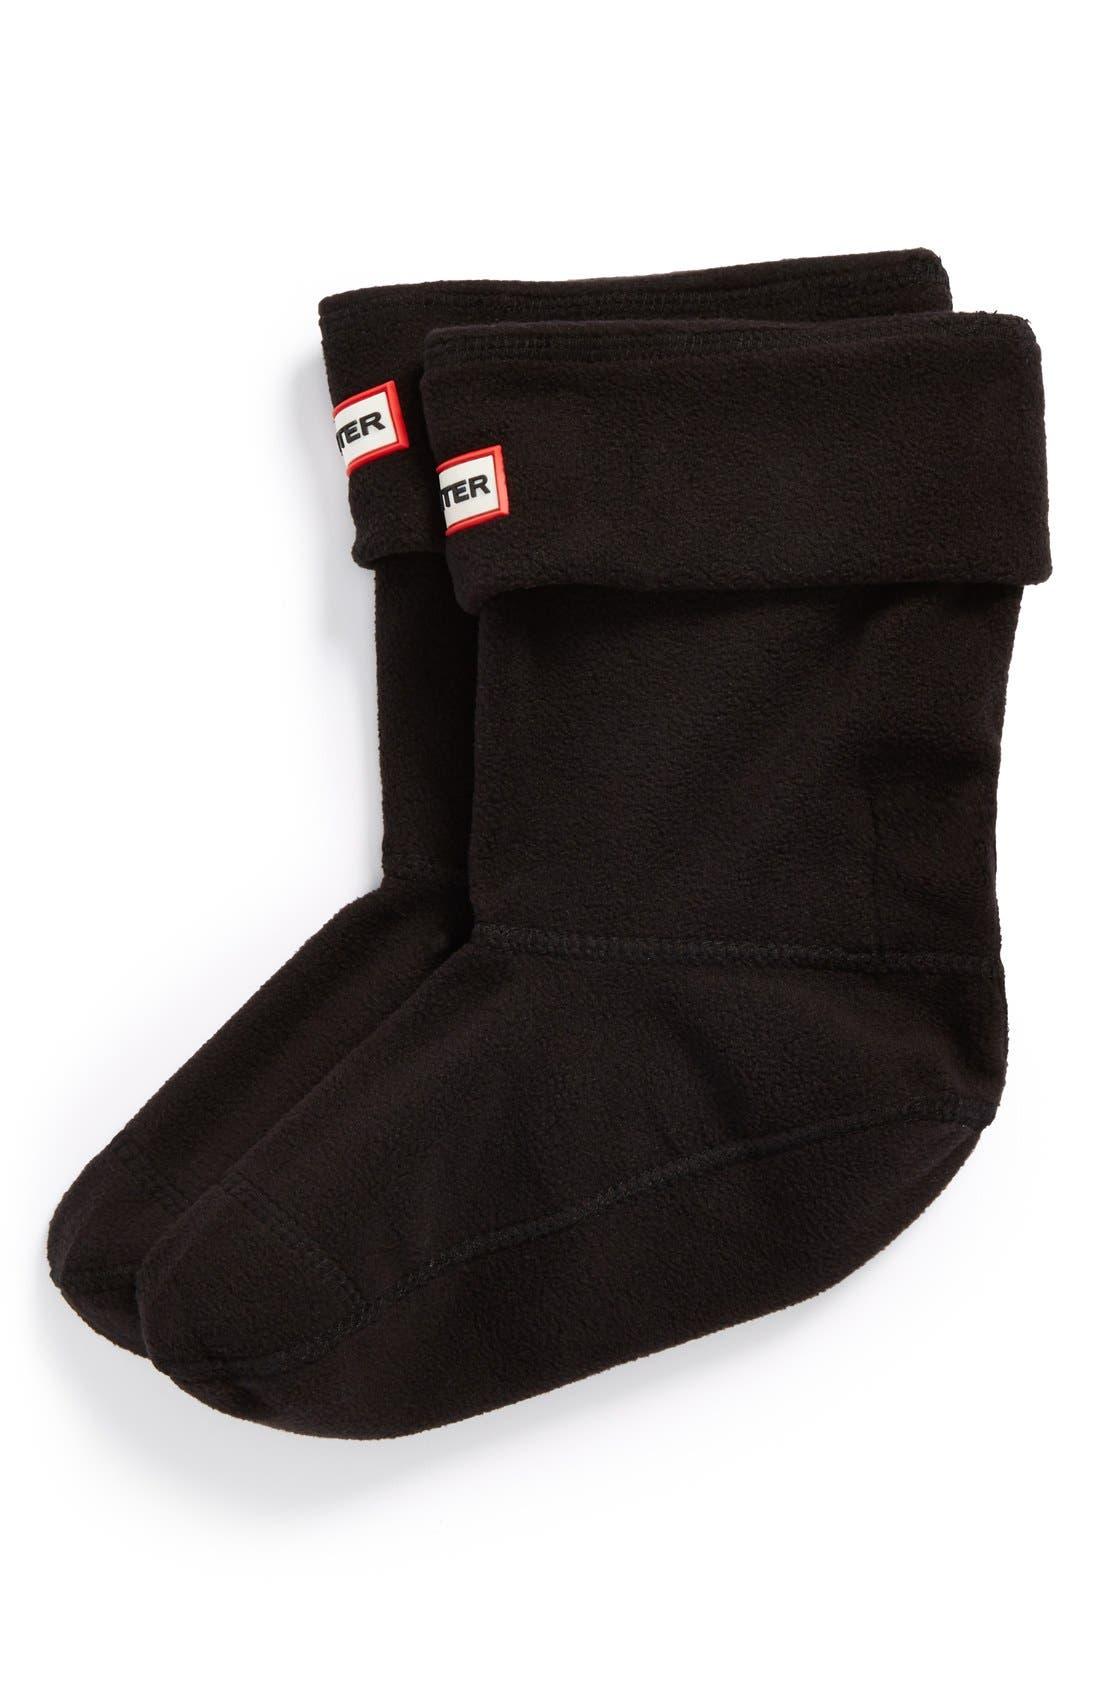 Short Fleece Welly Boot Socks,                         Main,                         color, Black Fleece